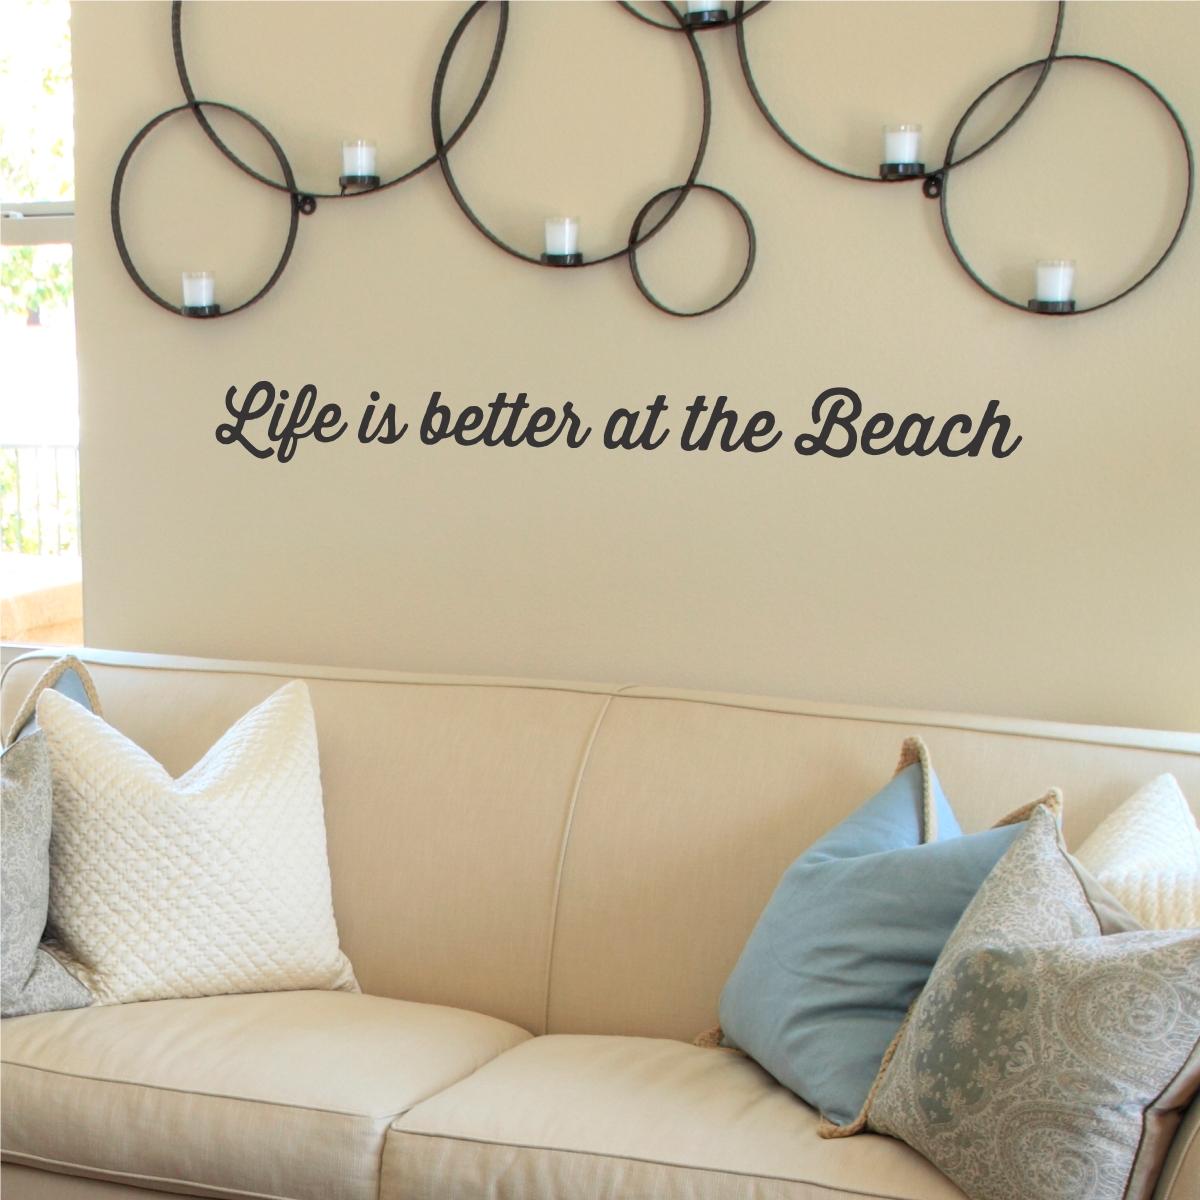 Beach Themed Wall Art Decorating Ideas – Best House Design Pertaining To Beach Theme Wall Art (Image 7 of 20)